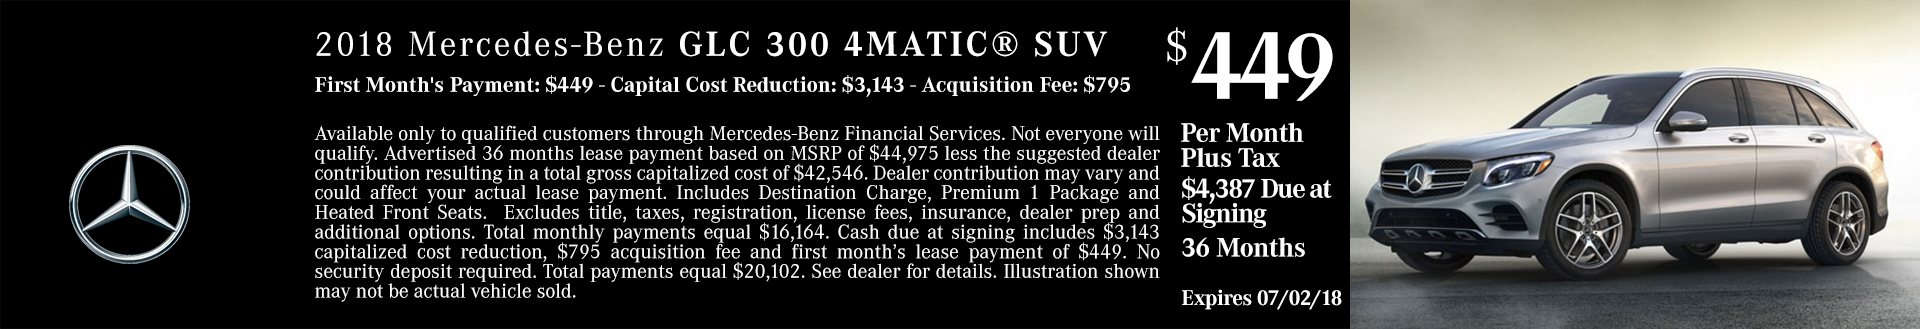 New 2018 Mercedes GLC 300 4MATIC SUV For Sale Boise